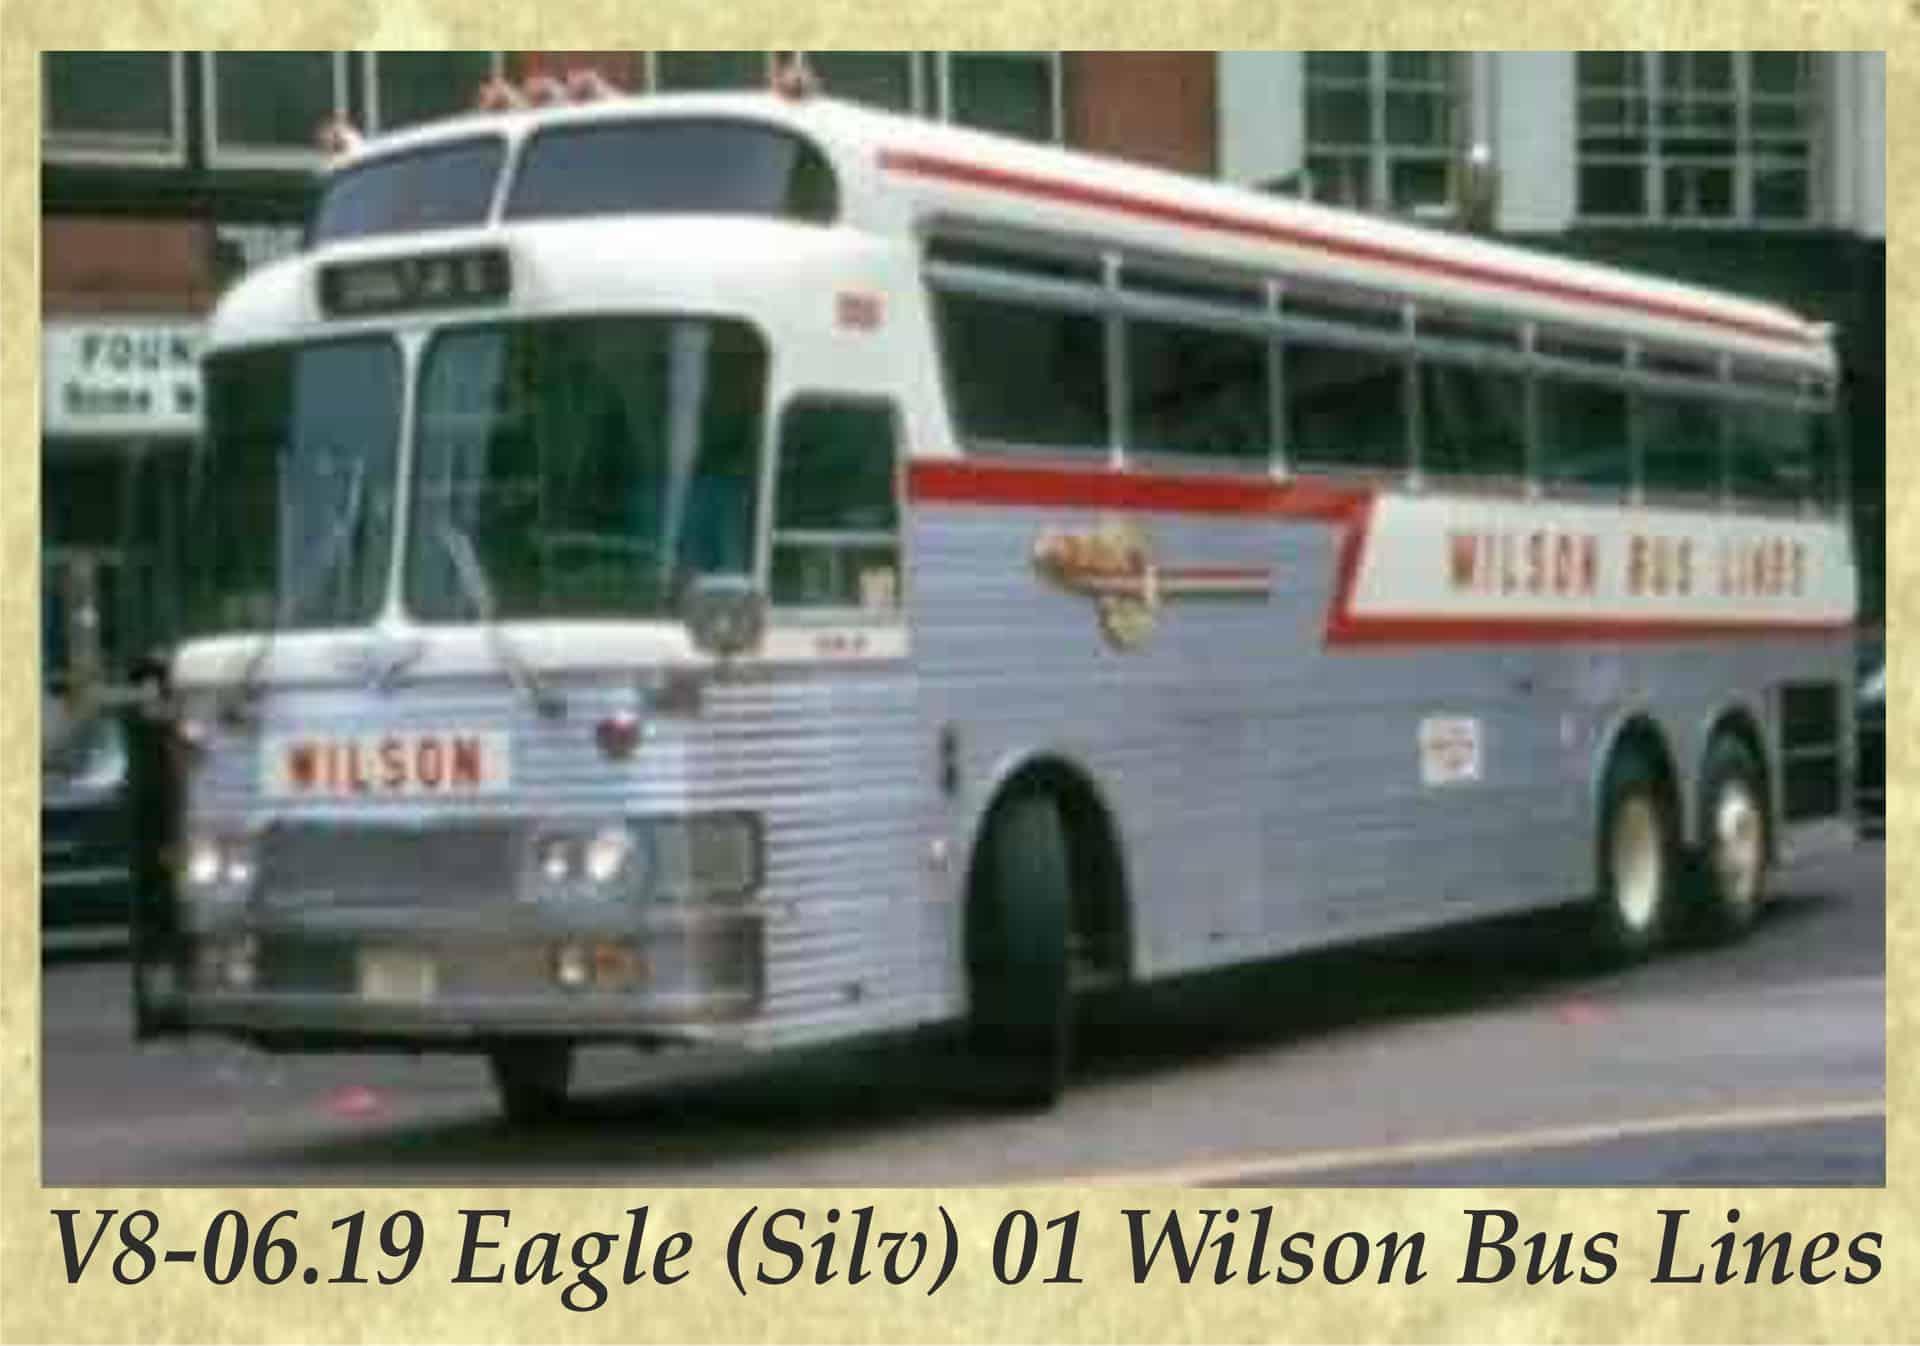 V8-06.19 Eagle (Silv) 01 Wilson Bus Lines